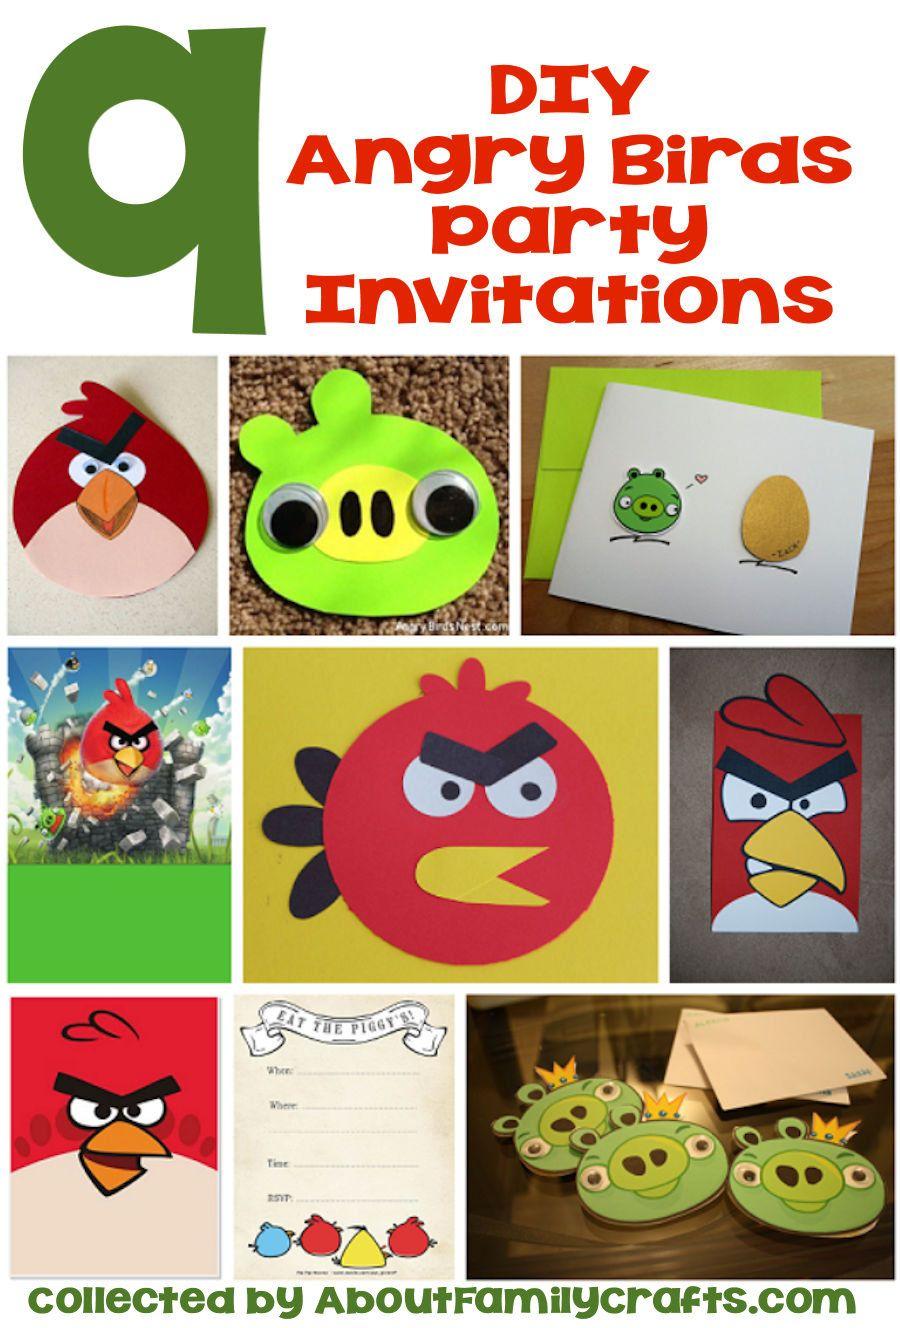 DIY Angry Birds Party Invitations | Stuff to Buy | Pinterest | Bird ...